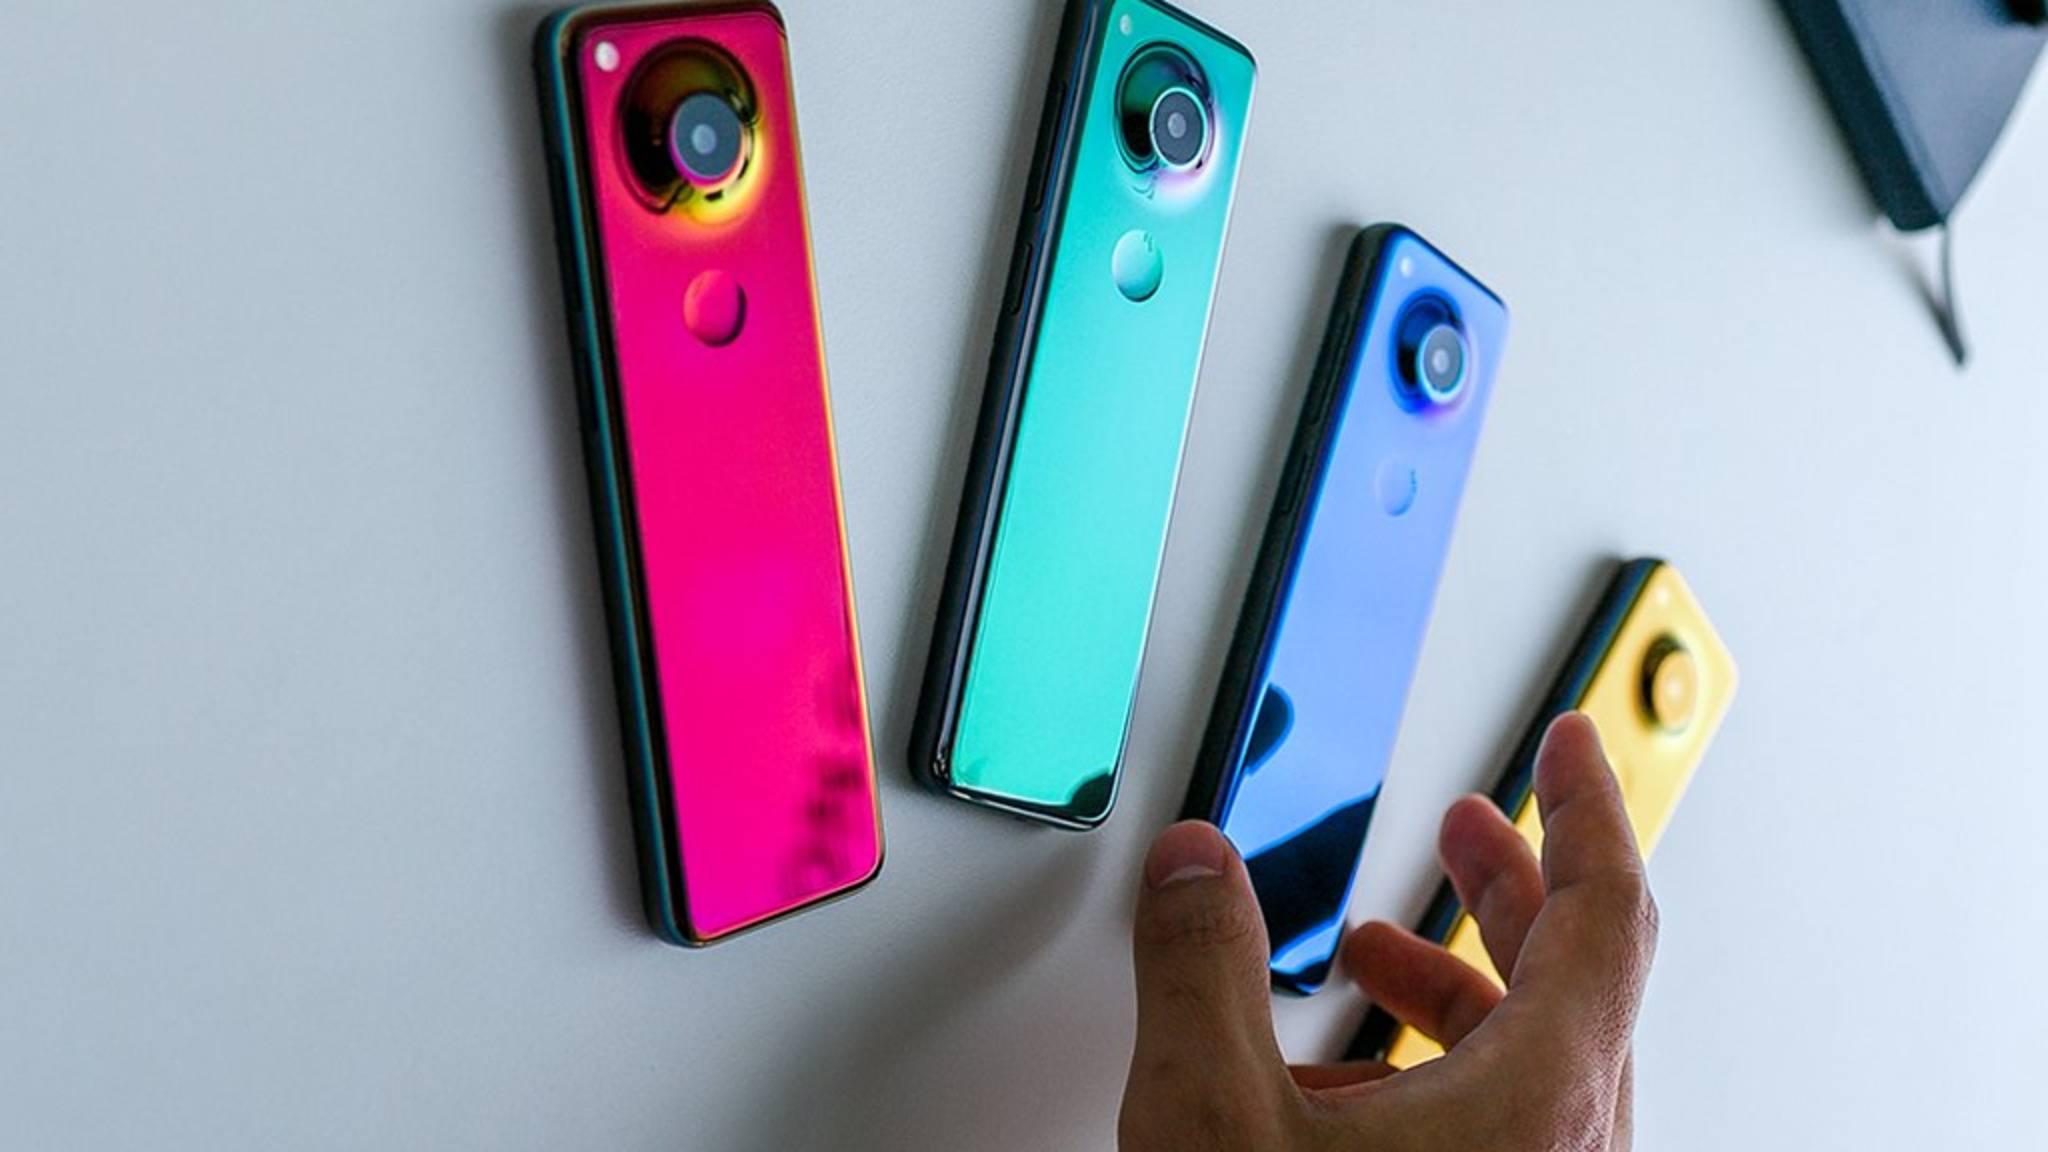 essential-phone-new